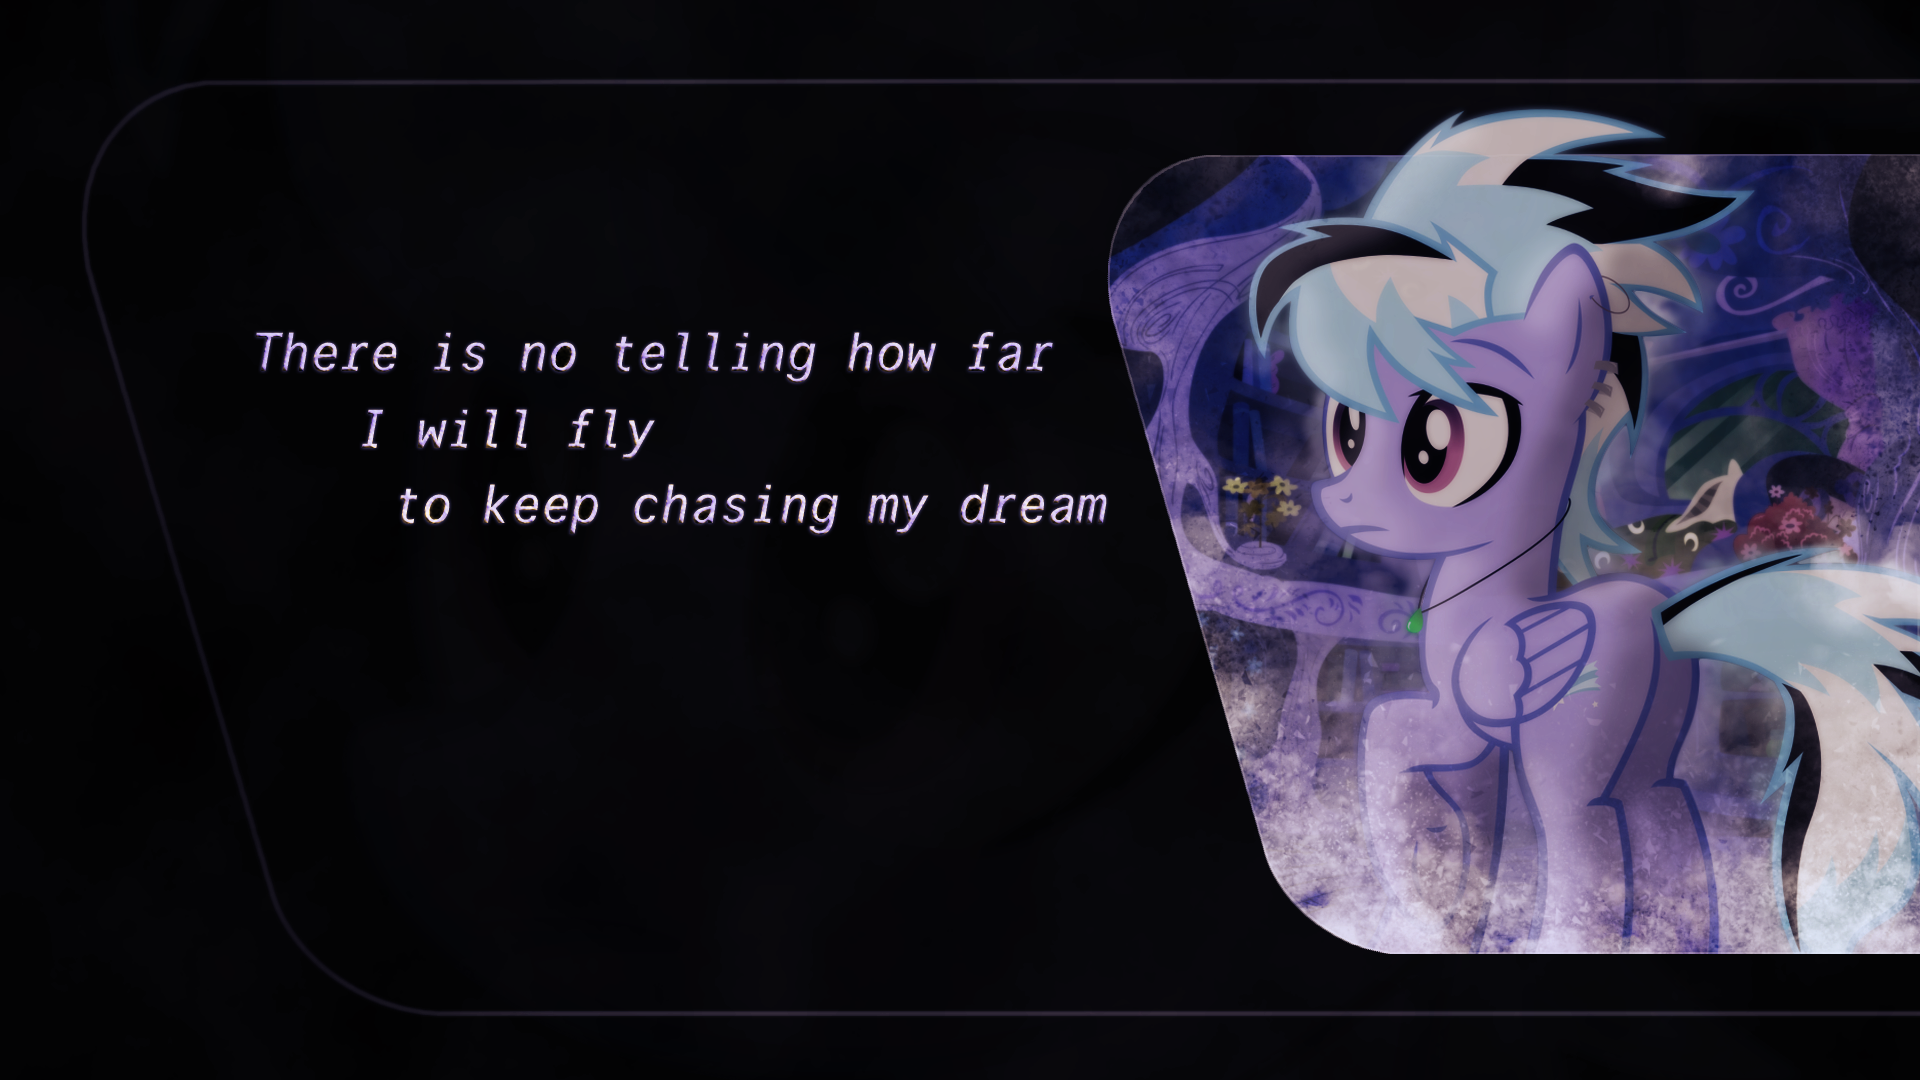 Cloudchaser the Dream Chaser by SandwichDelta